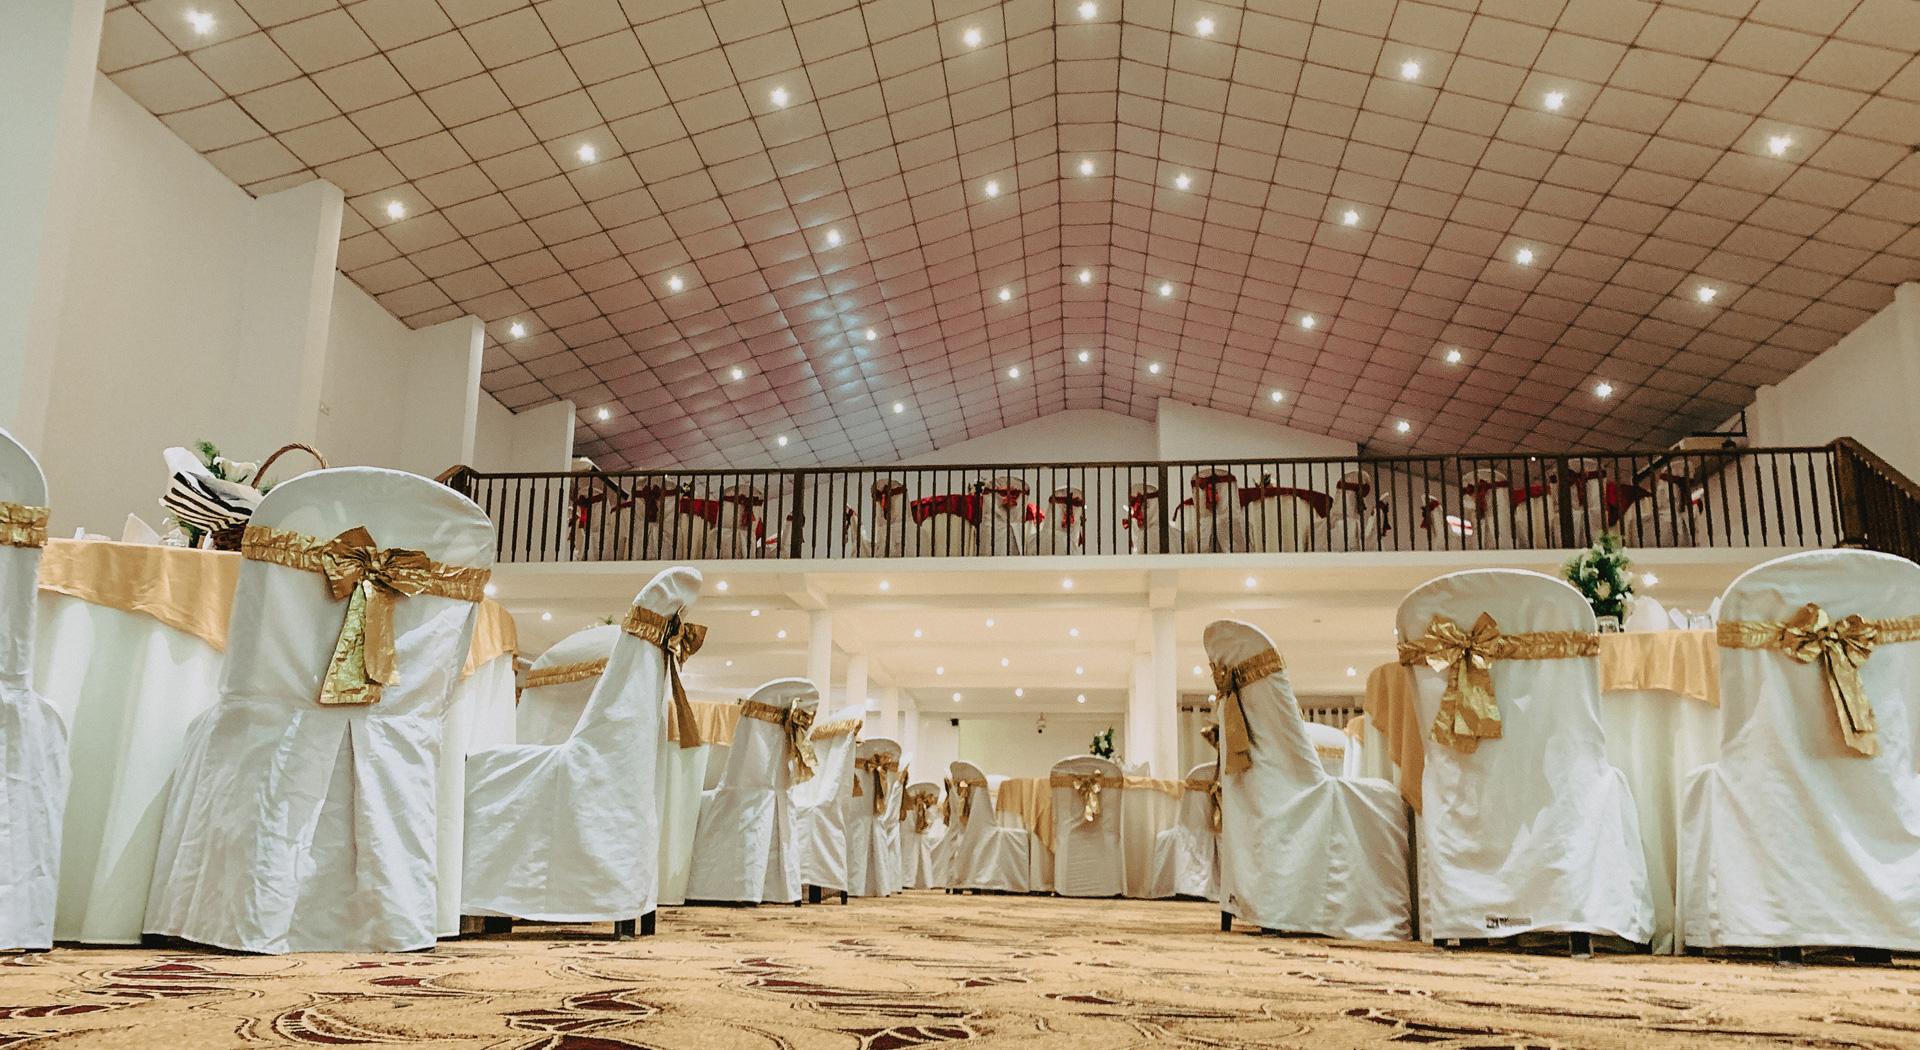 Wedding reception halls in matara matara hotels for wedding banquet halls matara junglespirit Image collections